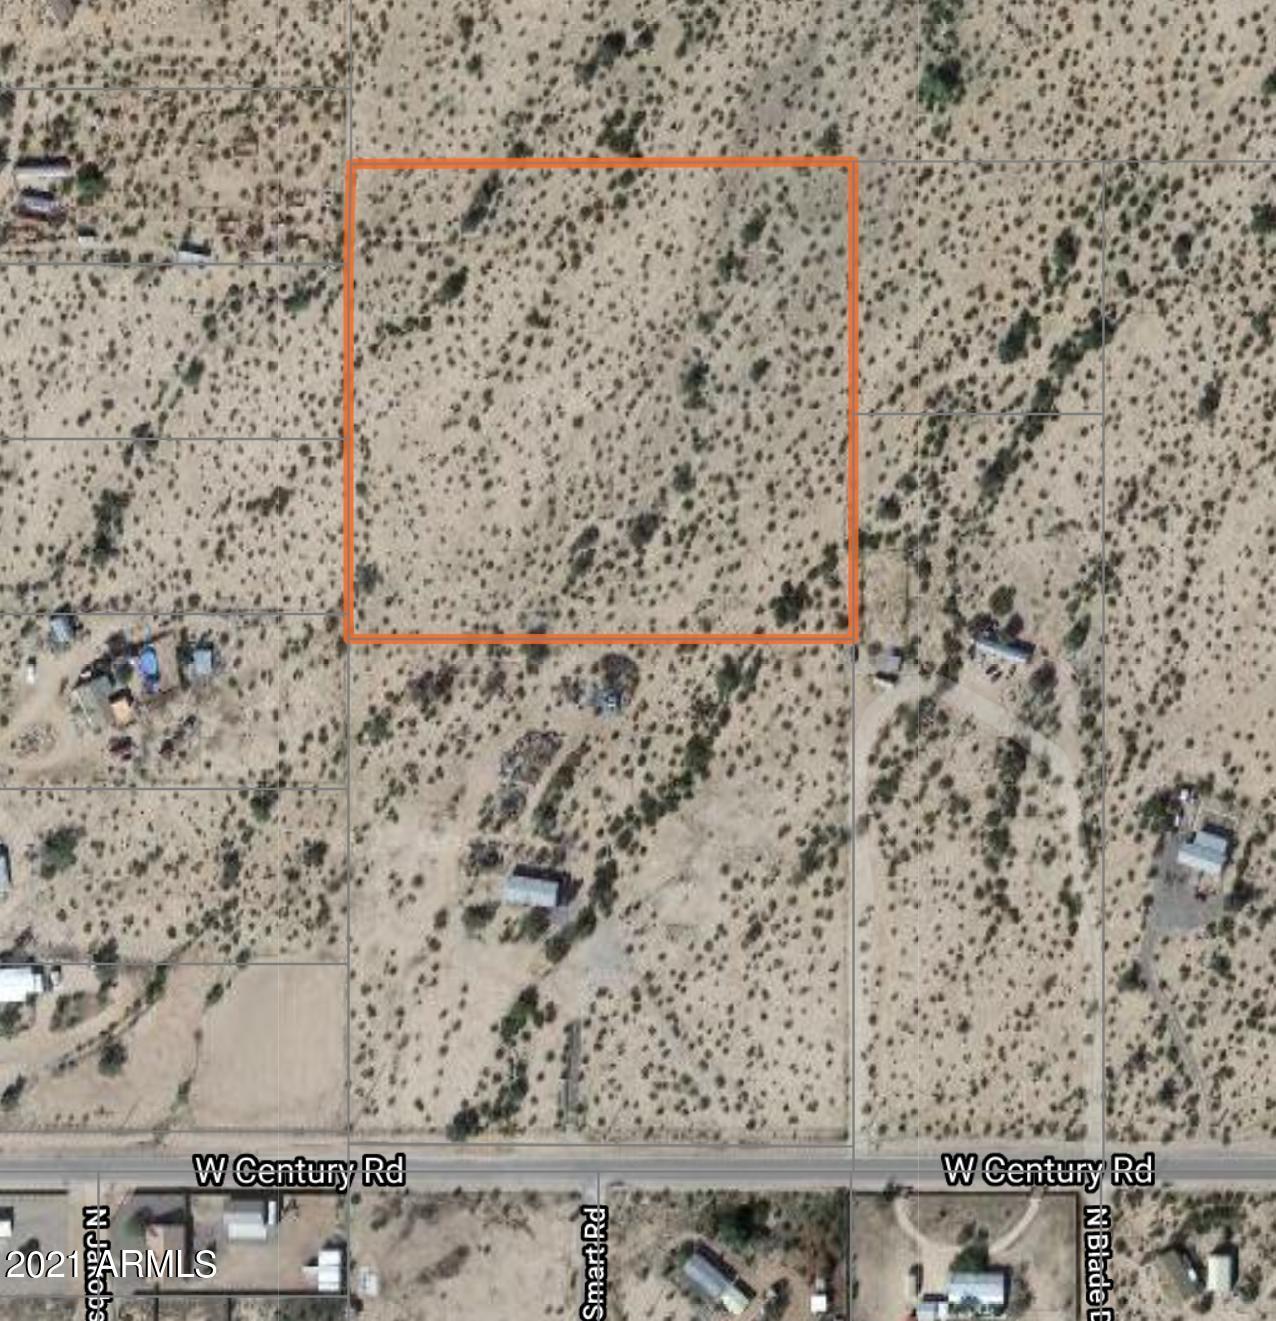 49110 W Century Road, Maricopa, AZ 85139, ,Land,For Sale,49110 W Century Road,6240559